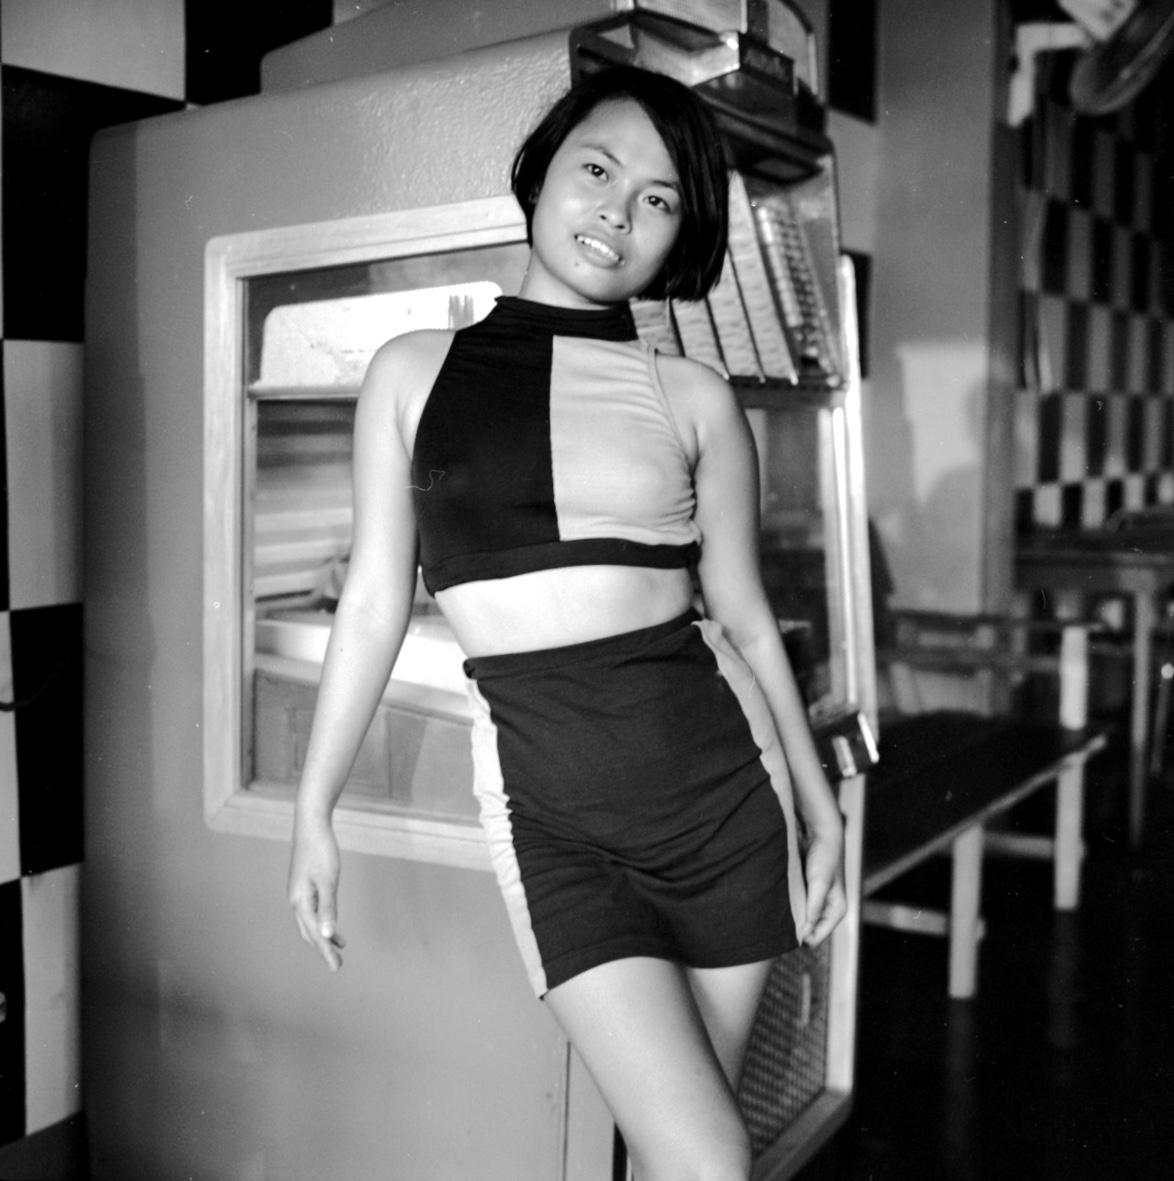 Upstairs Bar, Subic City, 1991